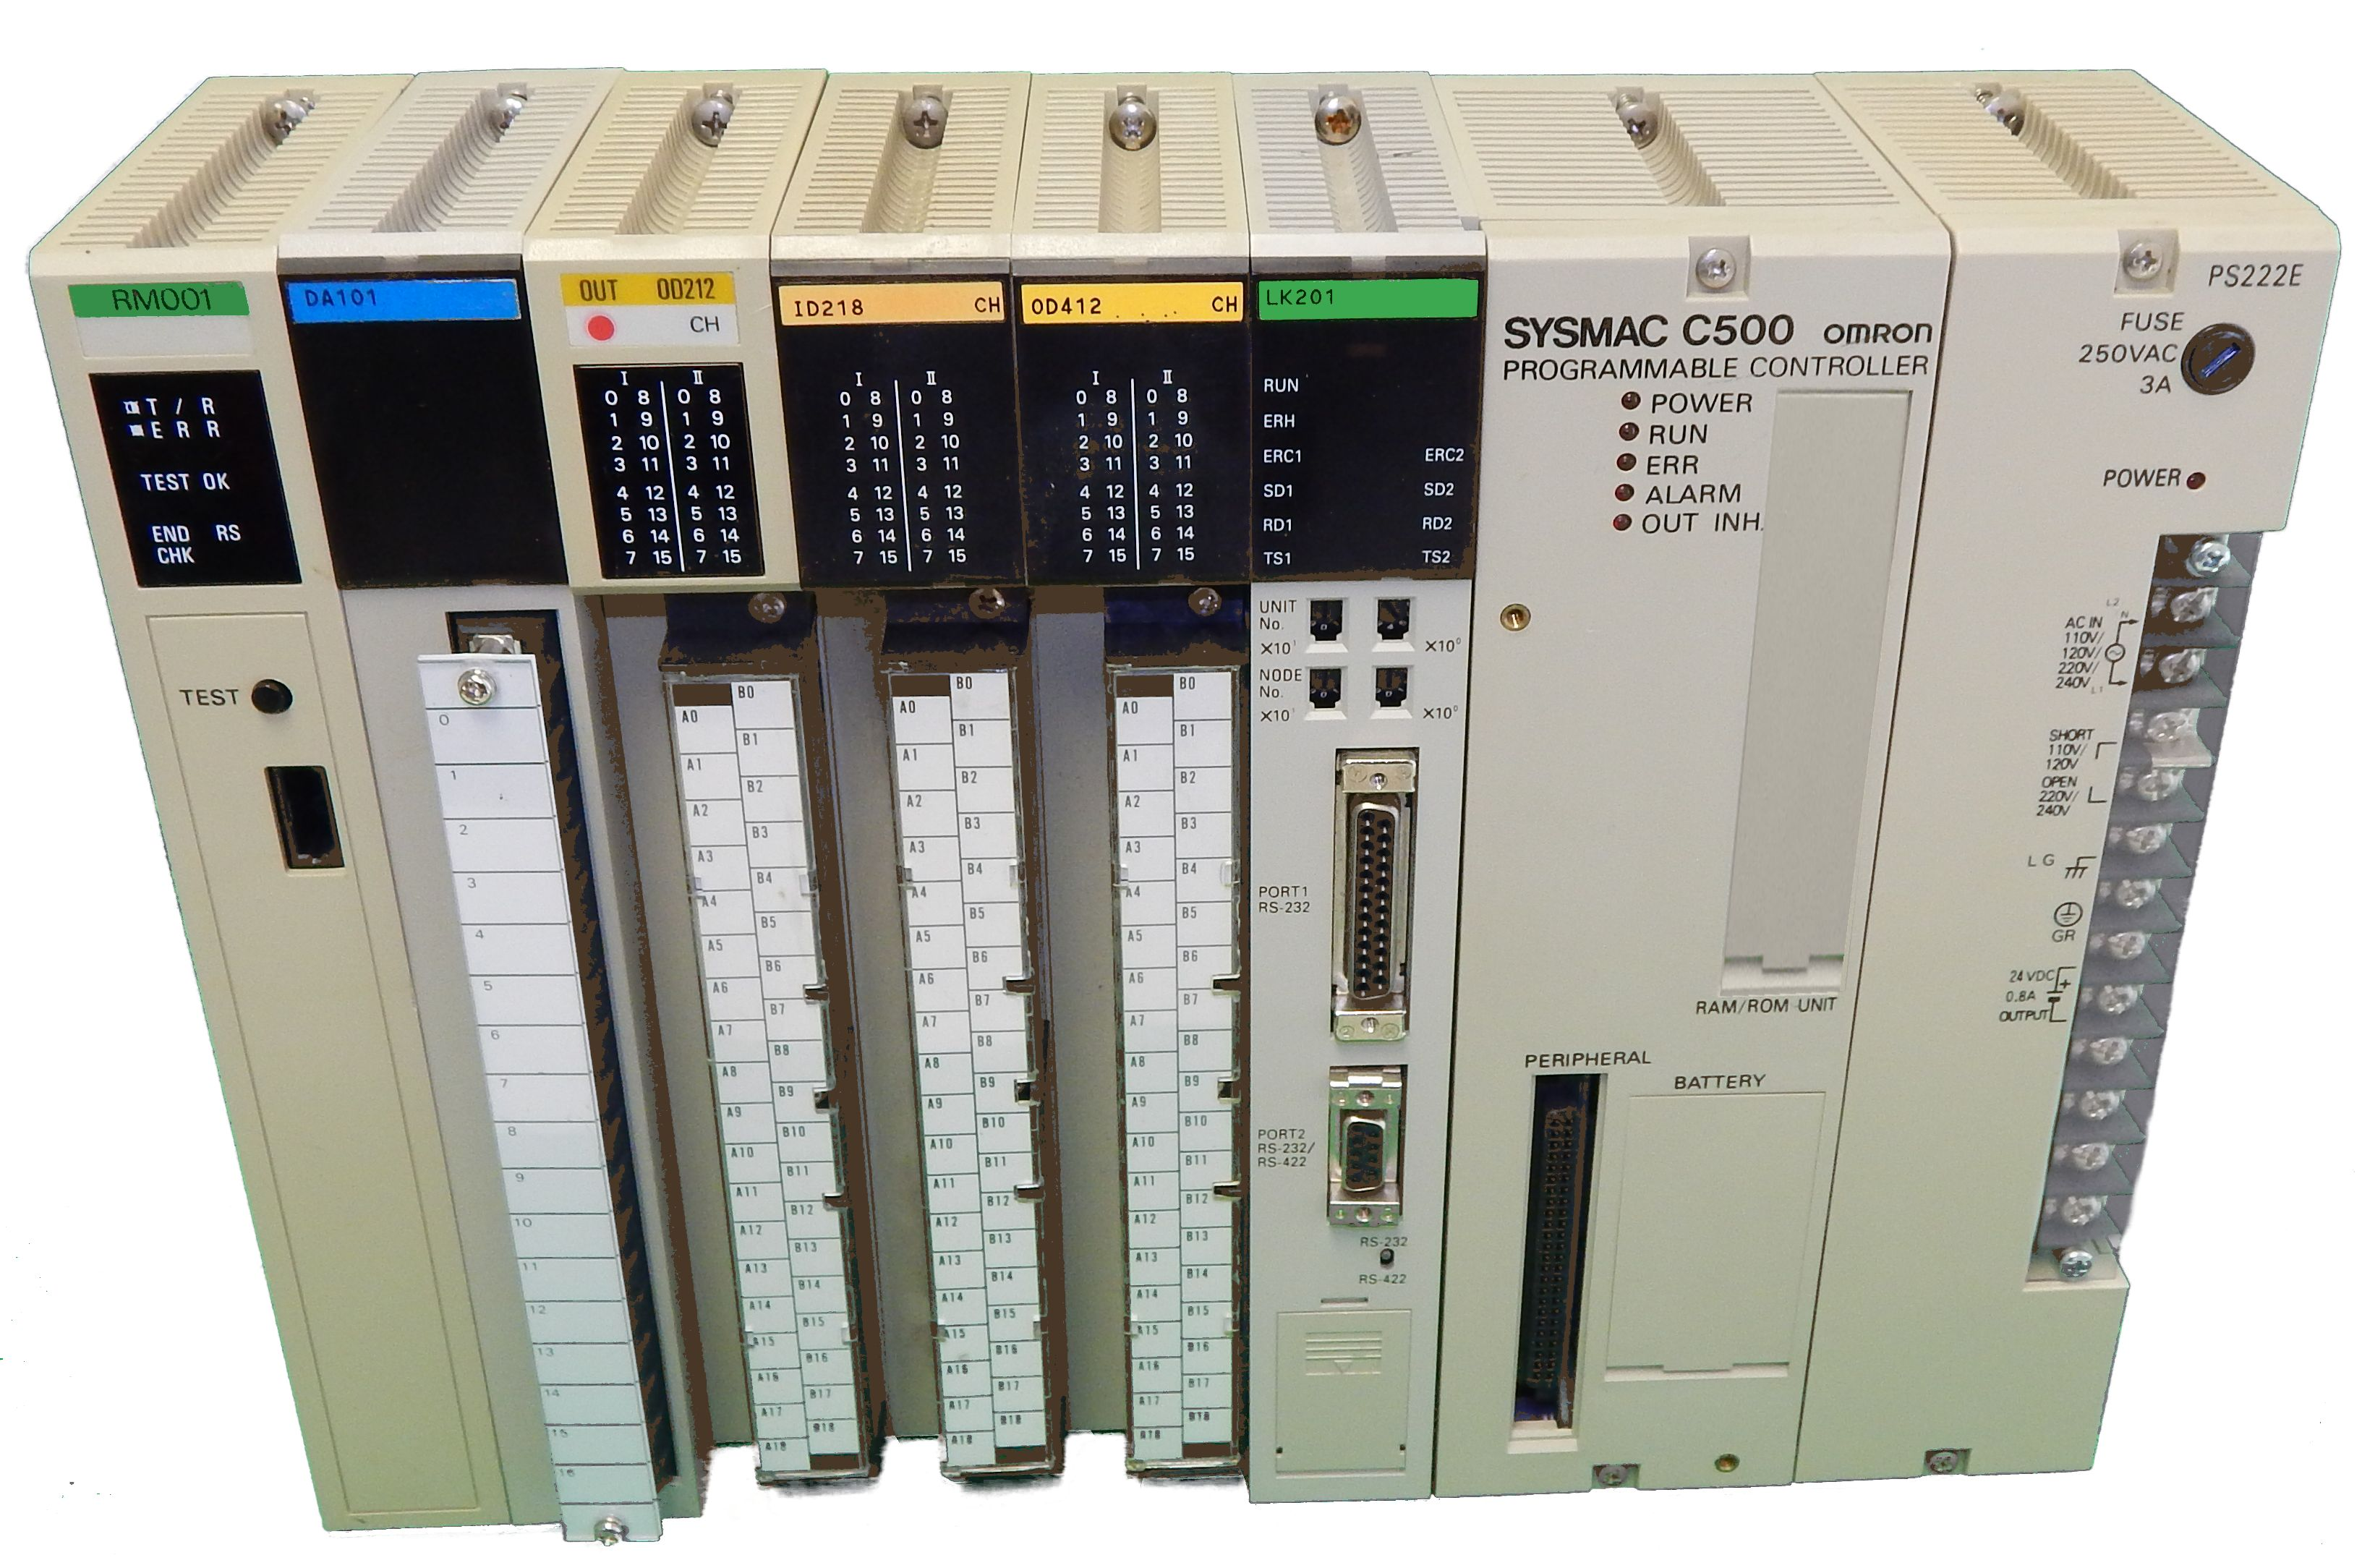 3G2A5-ID219